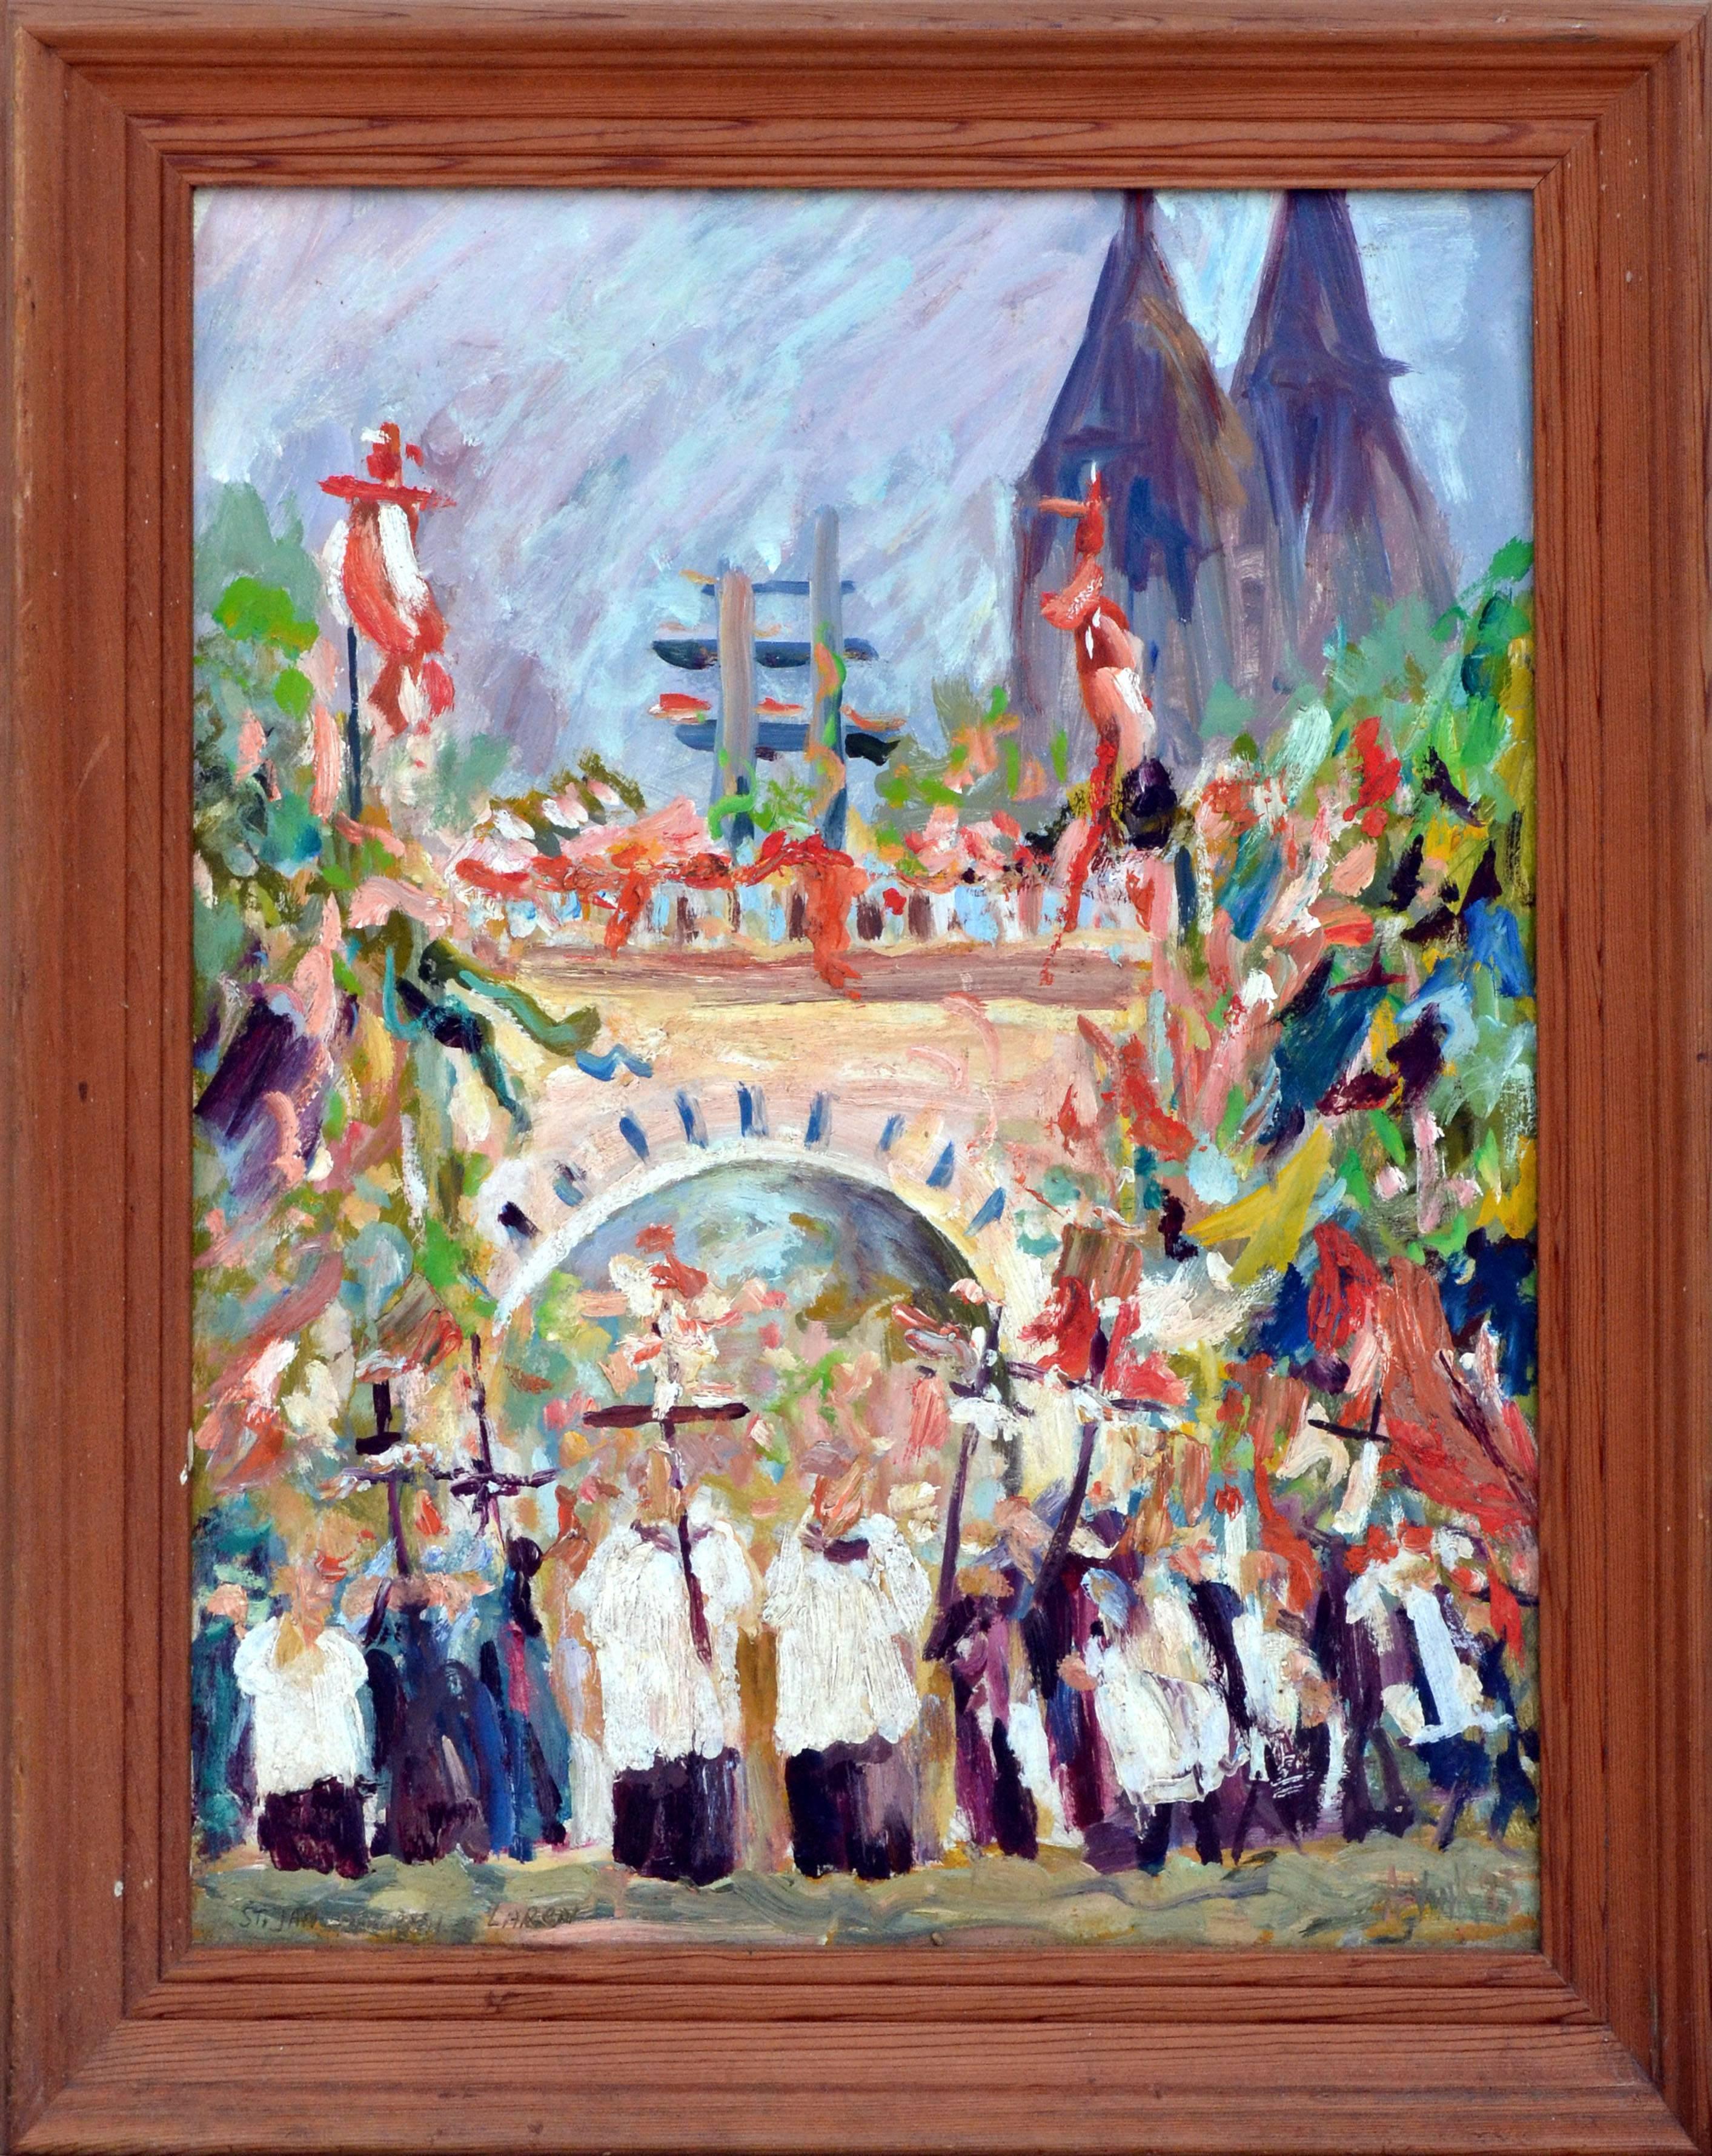 The Procession at St. Lauren Holland - Figurative Landscape